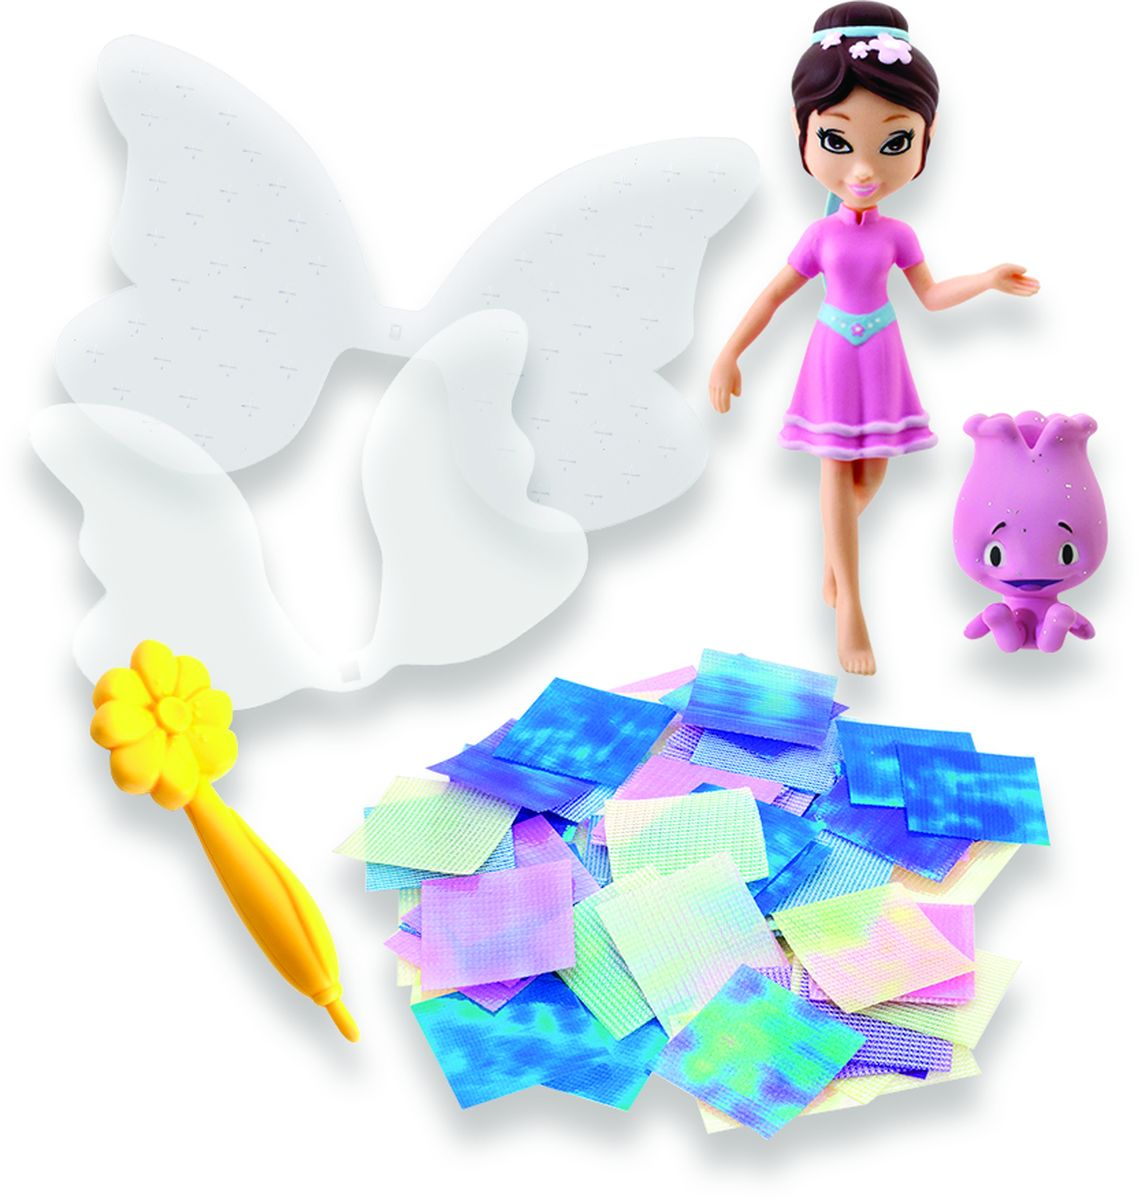 Shimmer Wing Игровой набор с мини-куклами Букетик и Тюльпан игровой набор волшебный дворец shimmer